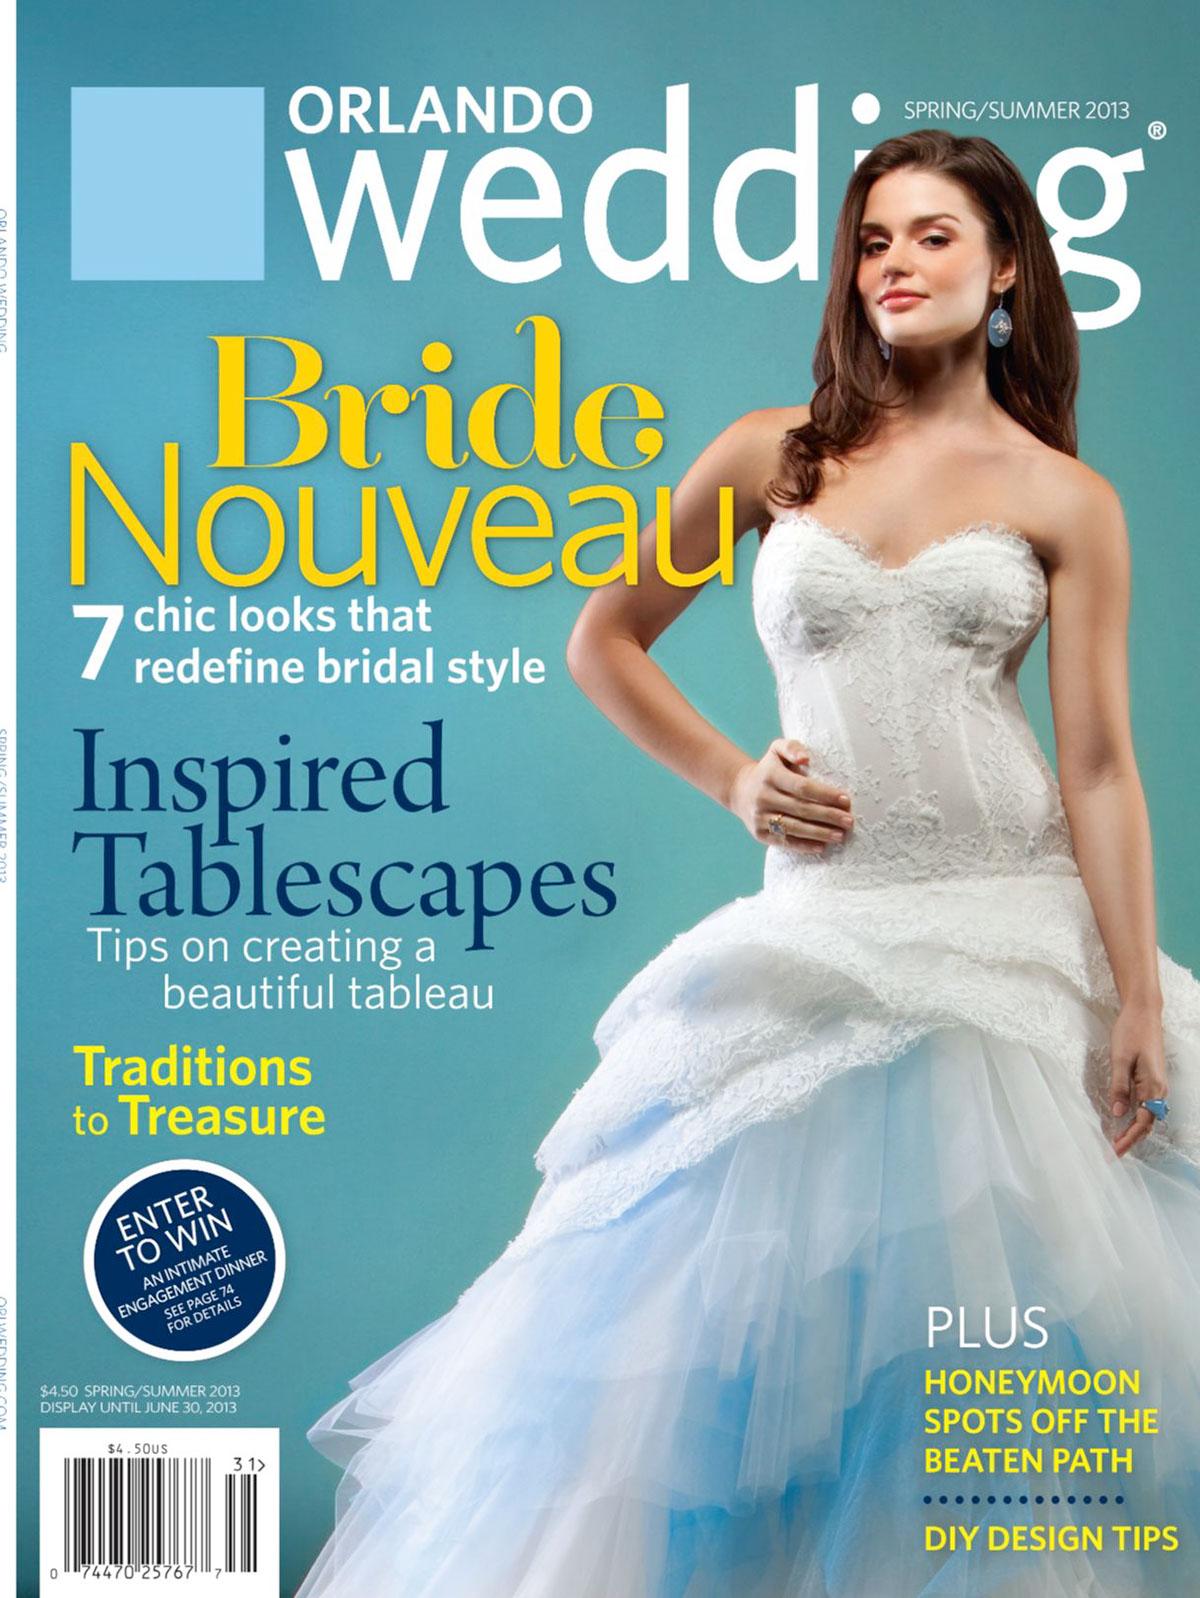 Orlando Wedding Magazine Spring/Summer 2013 on Behance